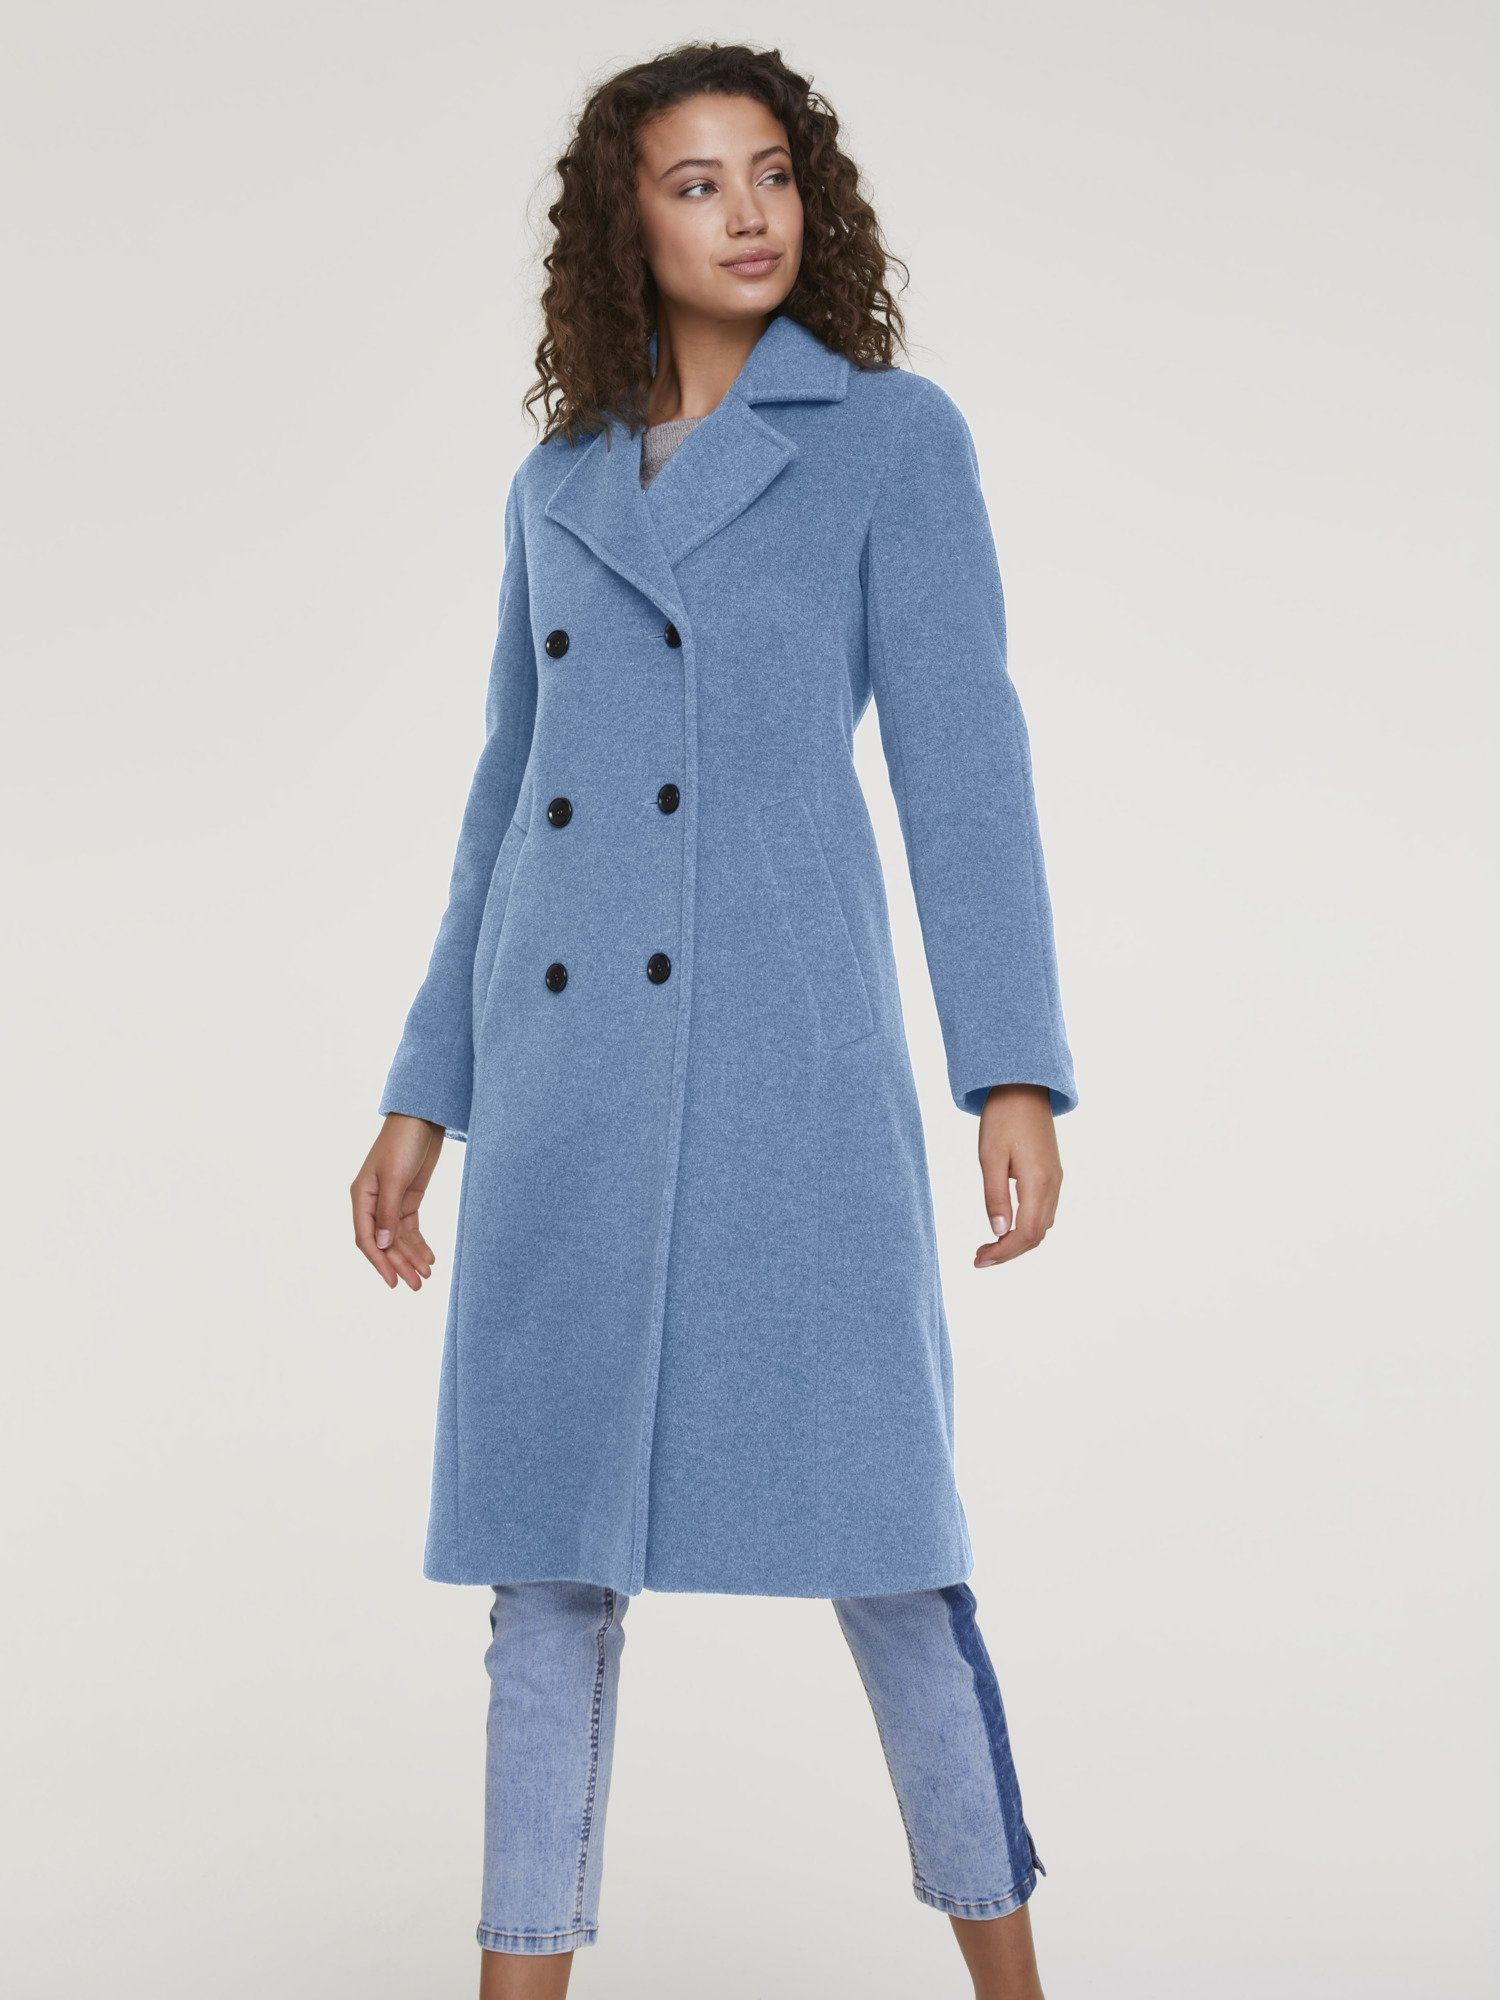 Gr.42,44 80/% Polyester Jacke neu 20/% Wolle Kurzjacke Heine